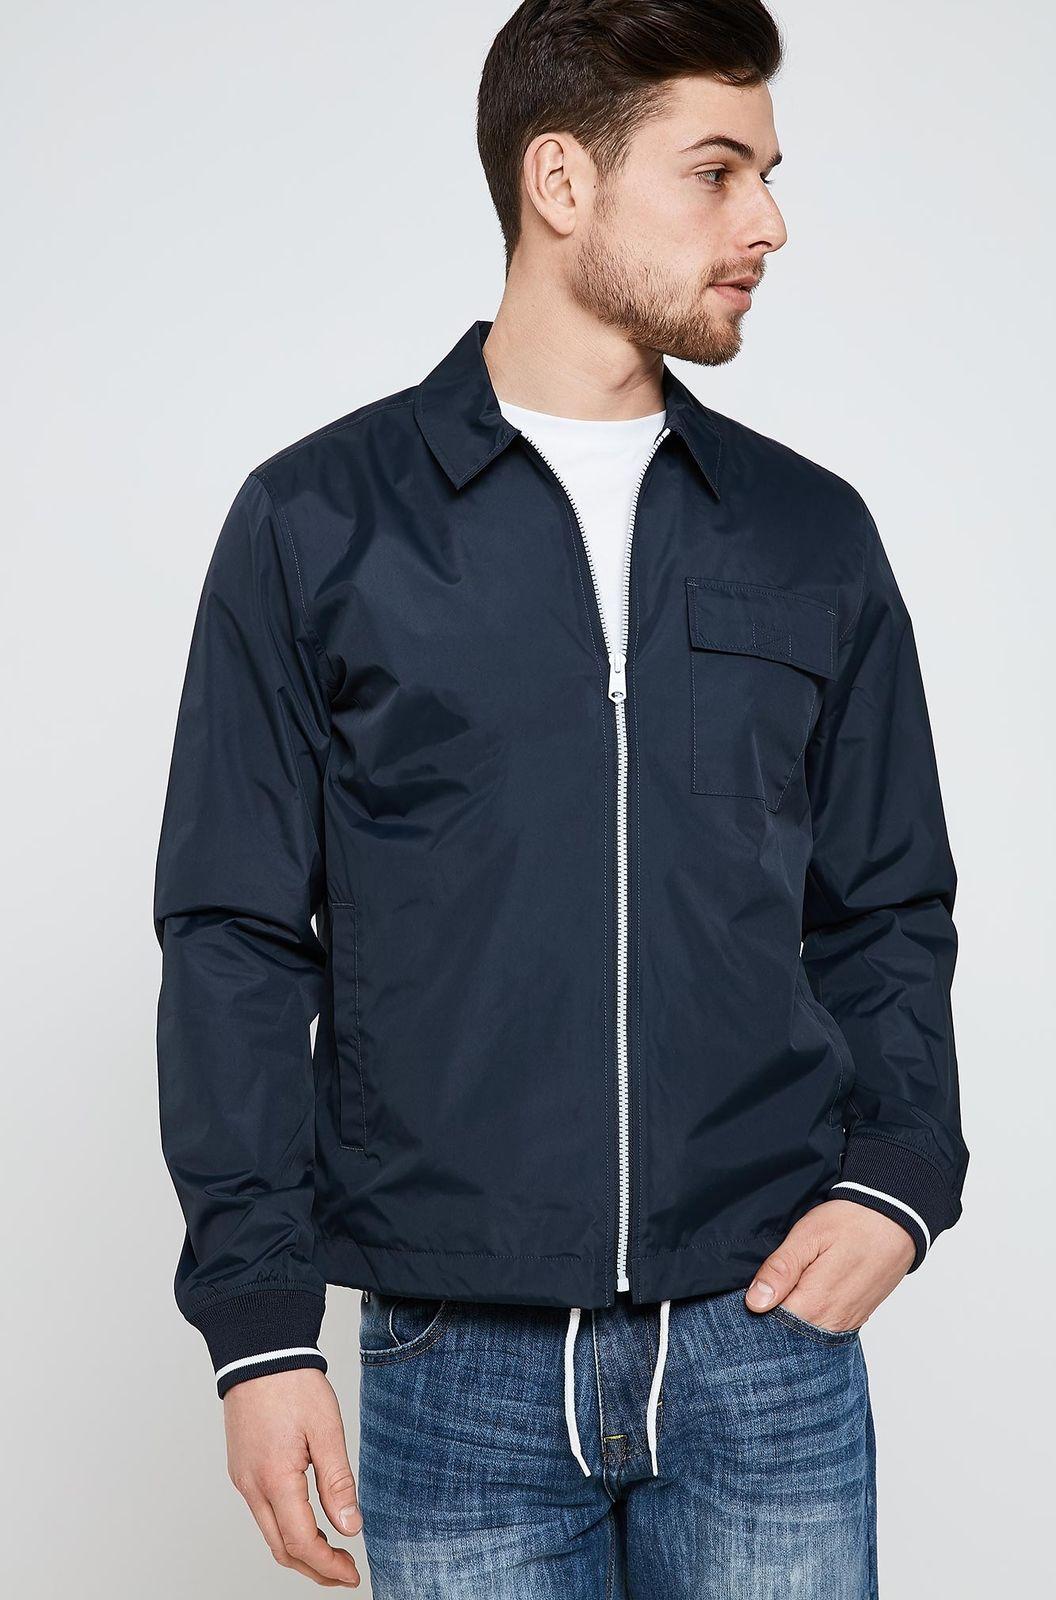 Threadbare Albany Harrington Mens Jacket - 2 Colours £10 (+£1.99 delivery) @ Brand Attic eBay Outlet